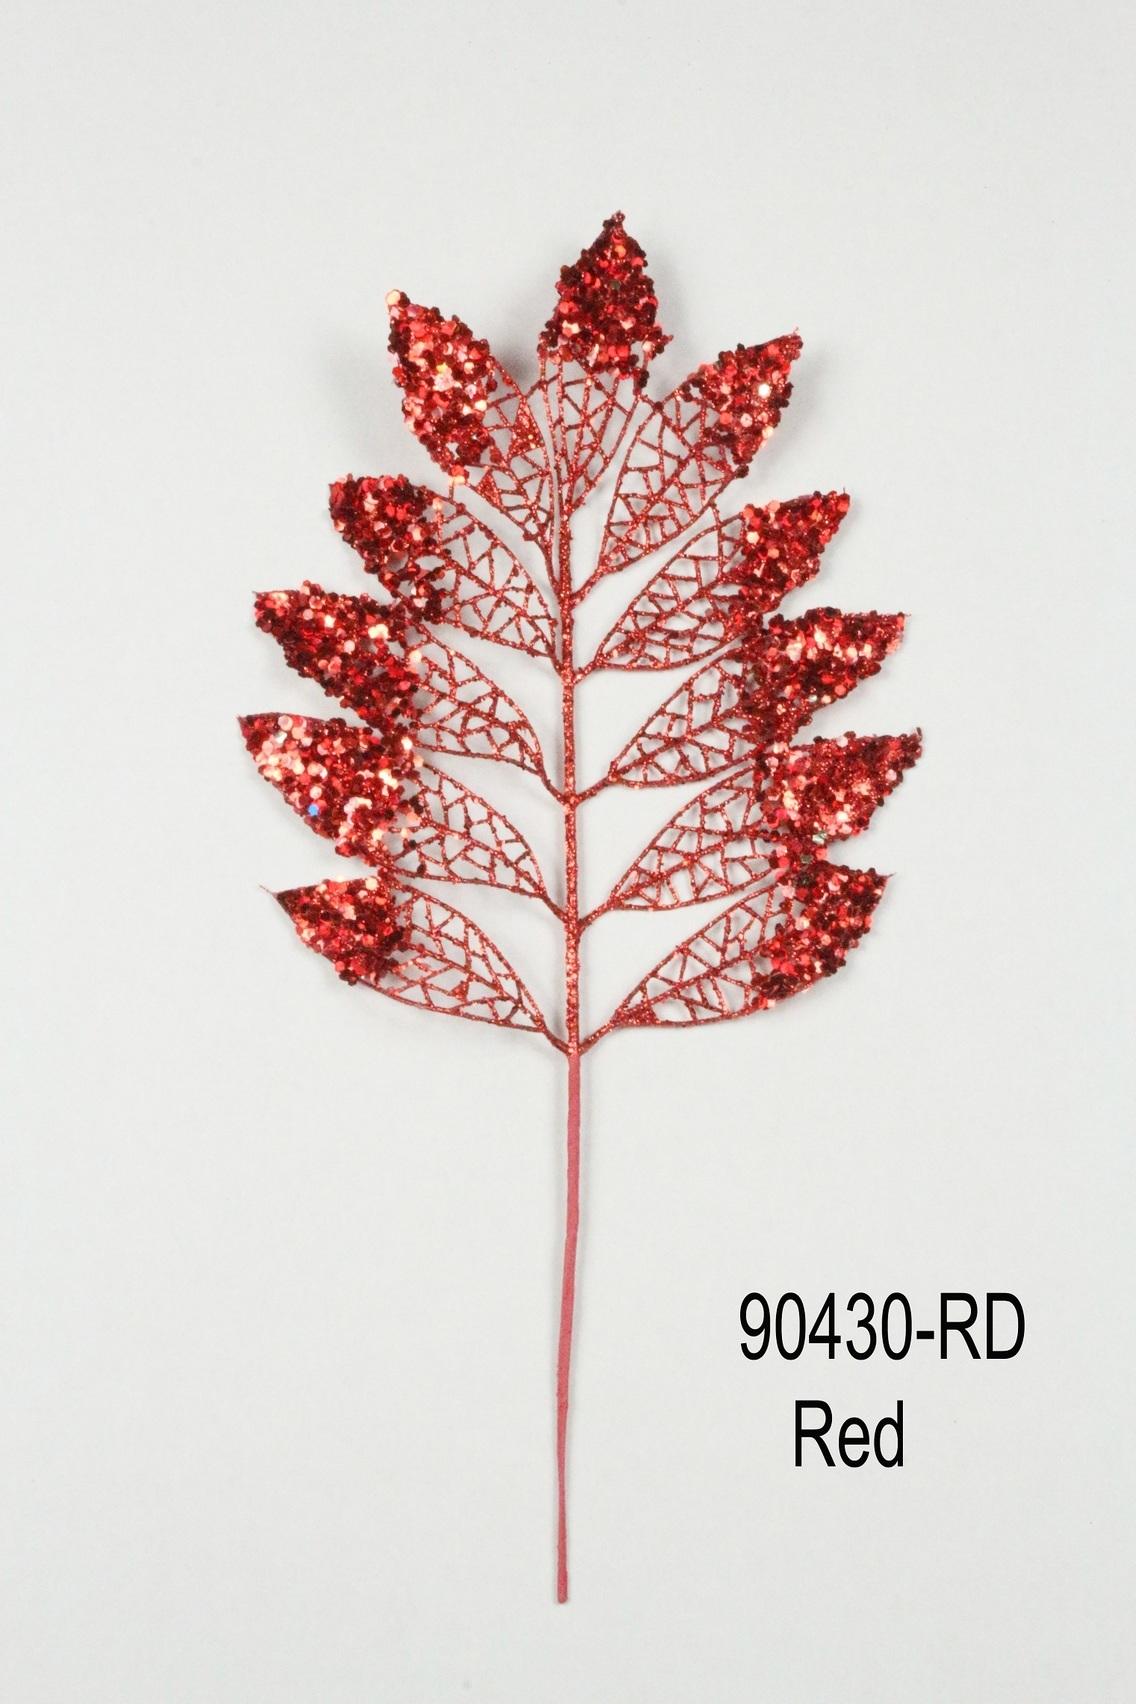 90430-RD